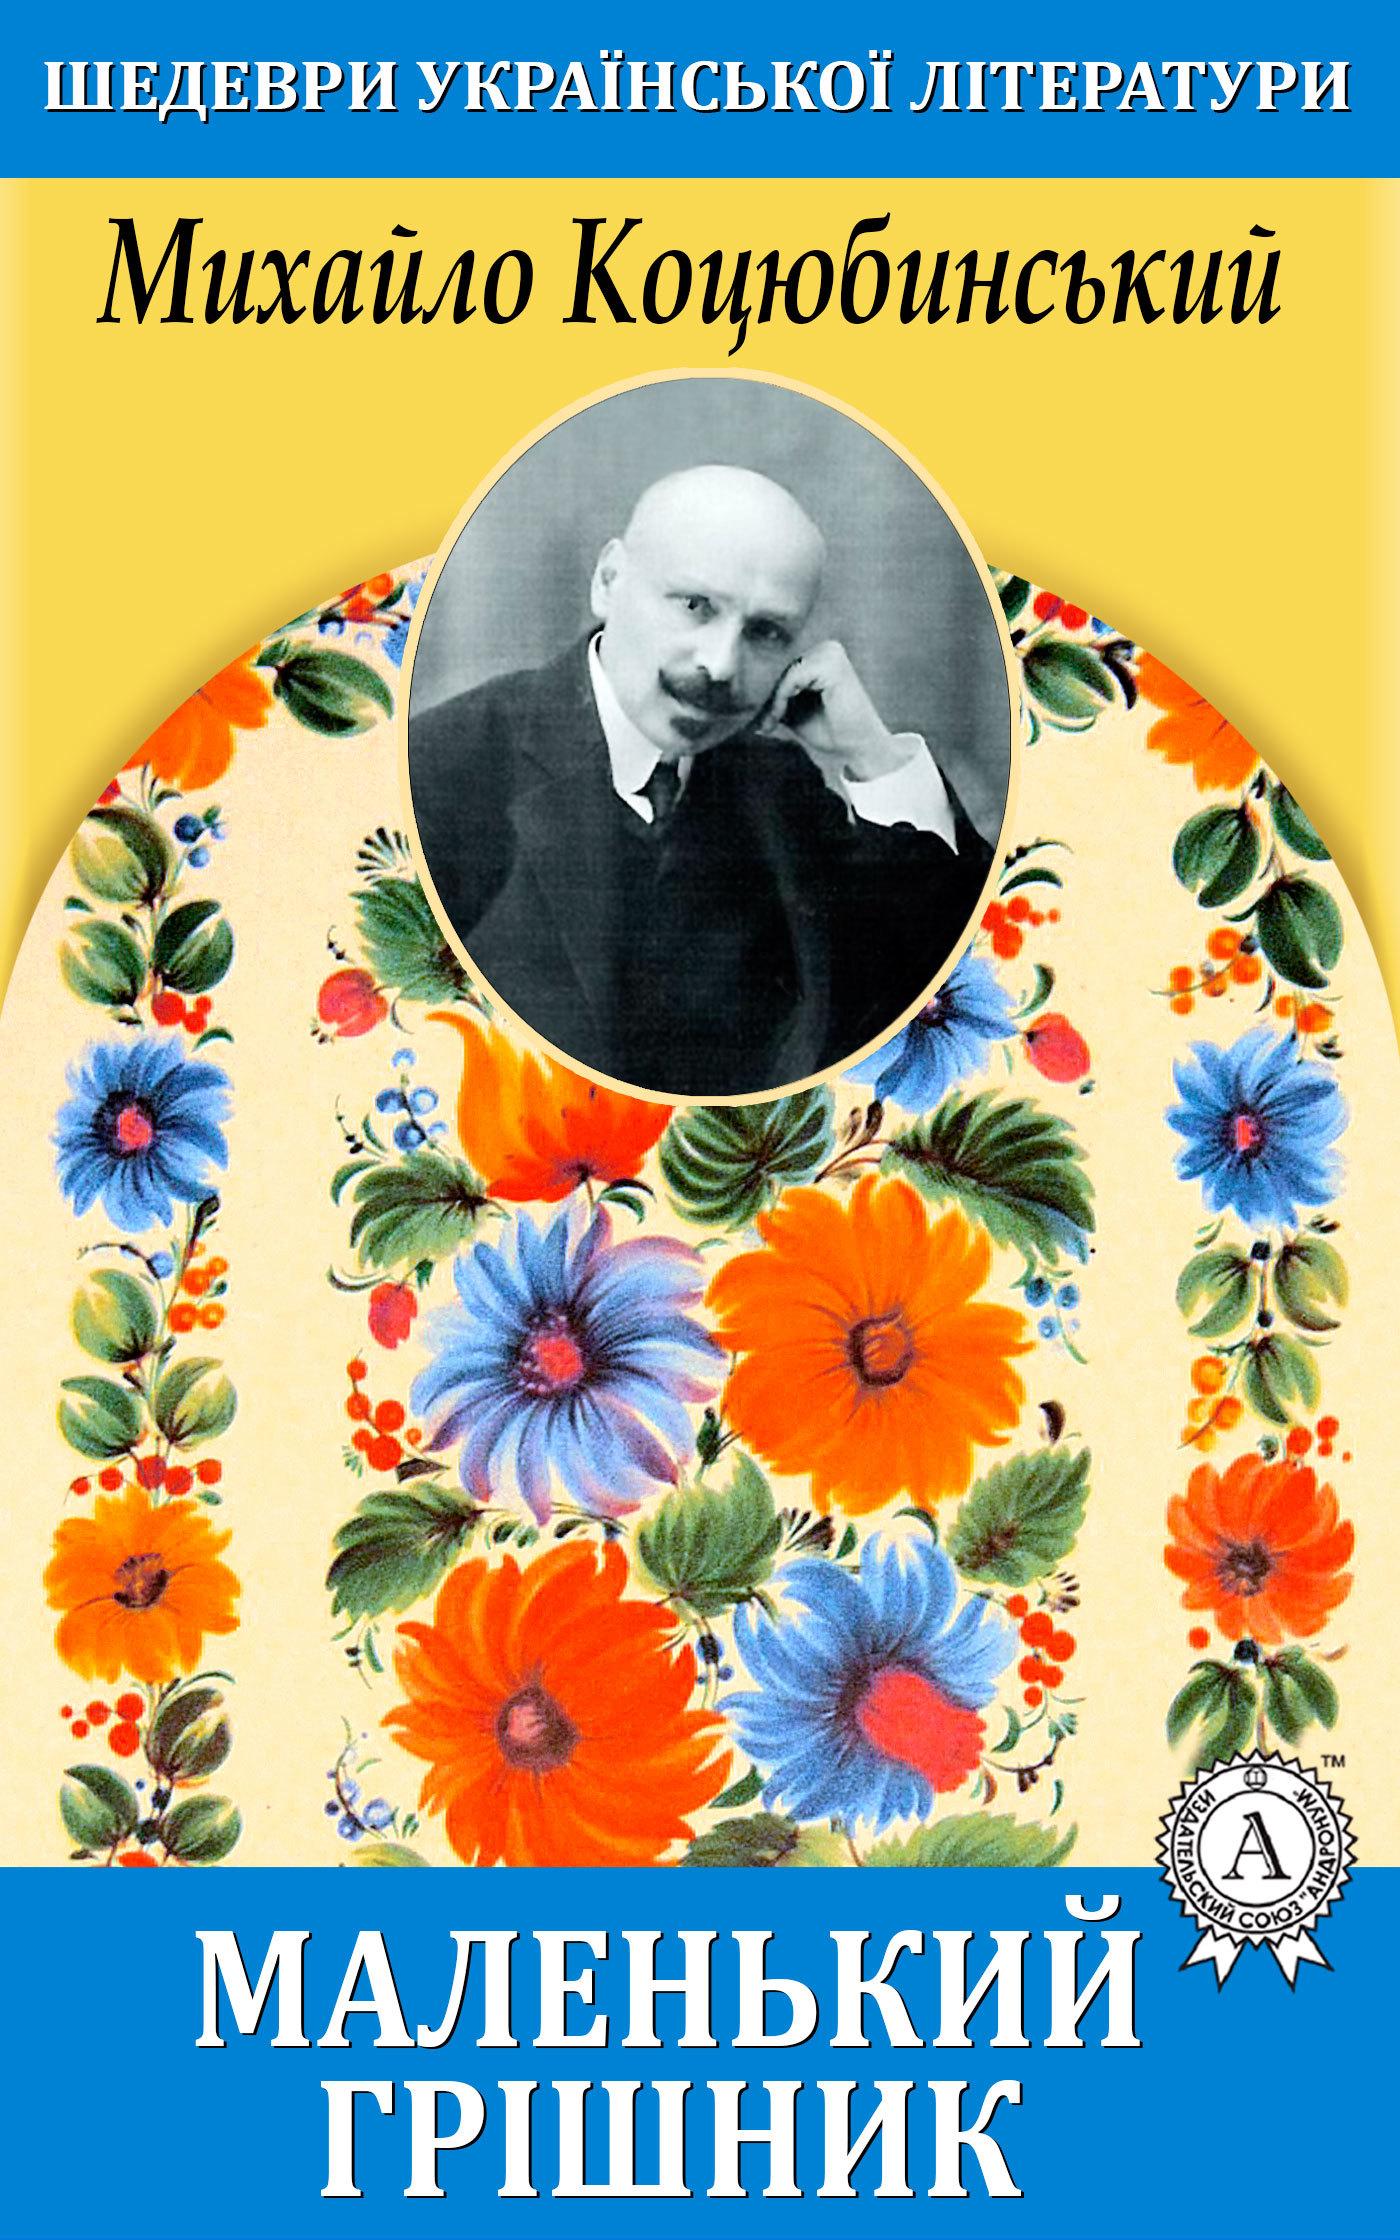 купить Михайло Коцюбинський Маленький грішник по цене 24.95 рублей